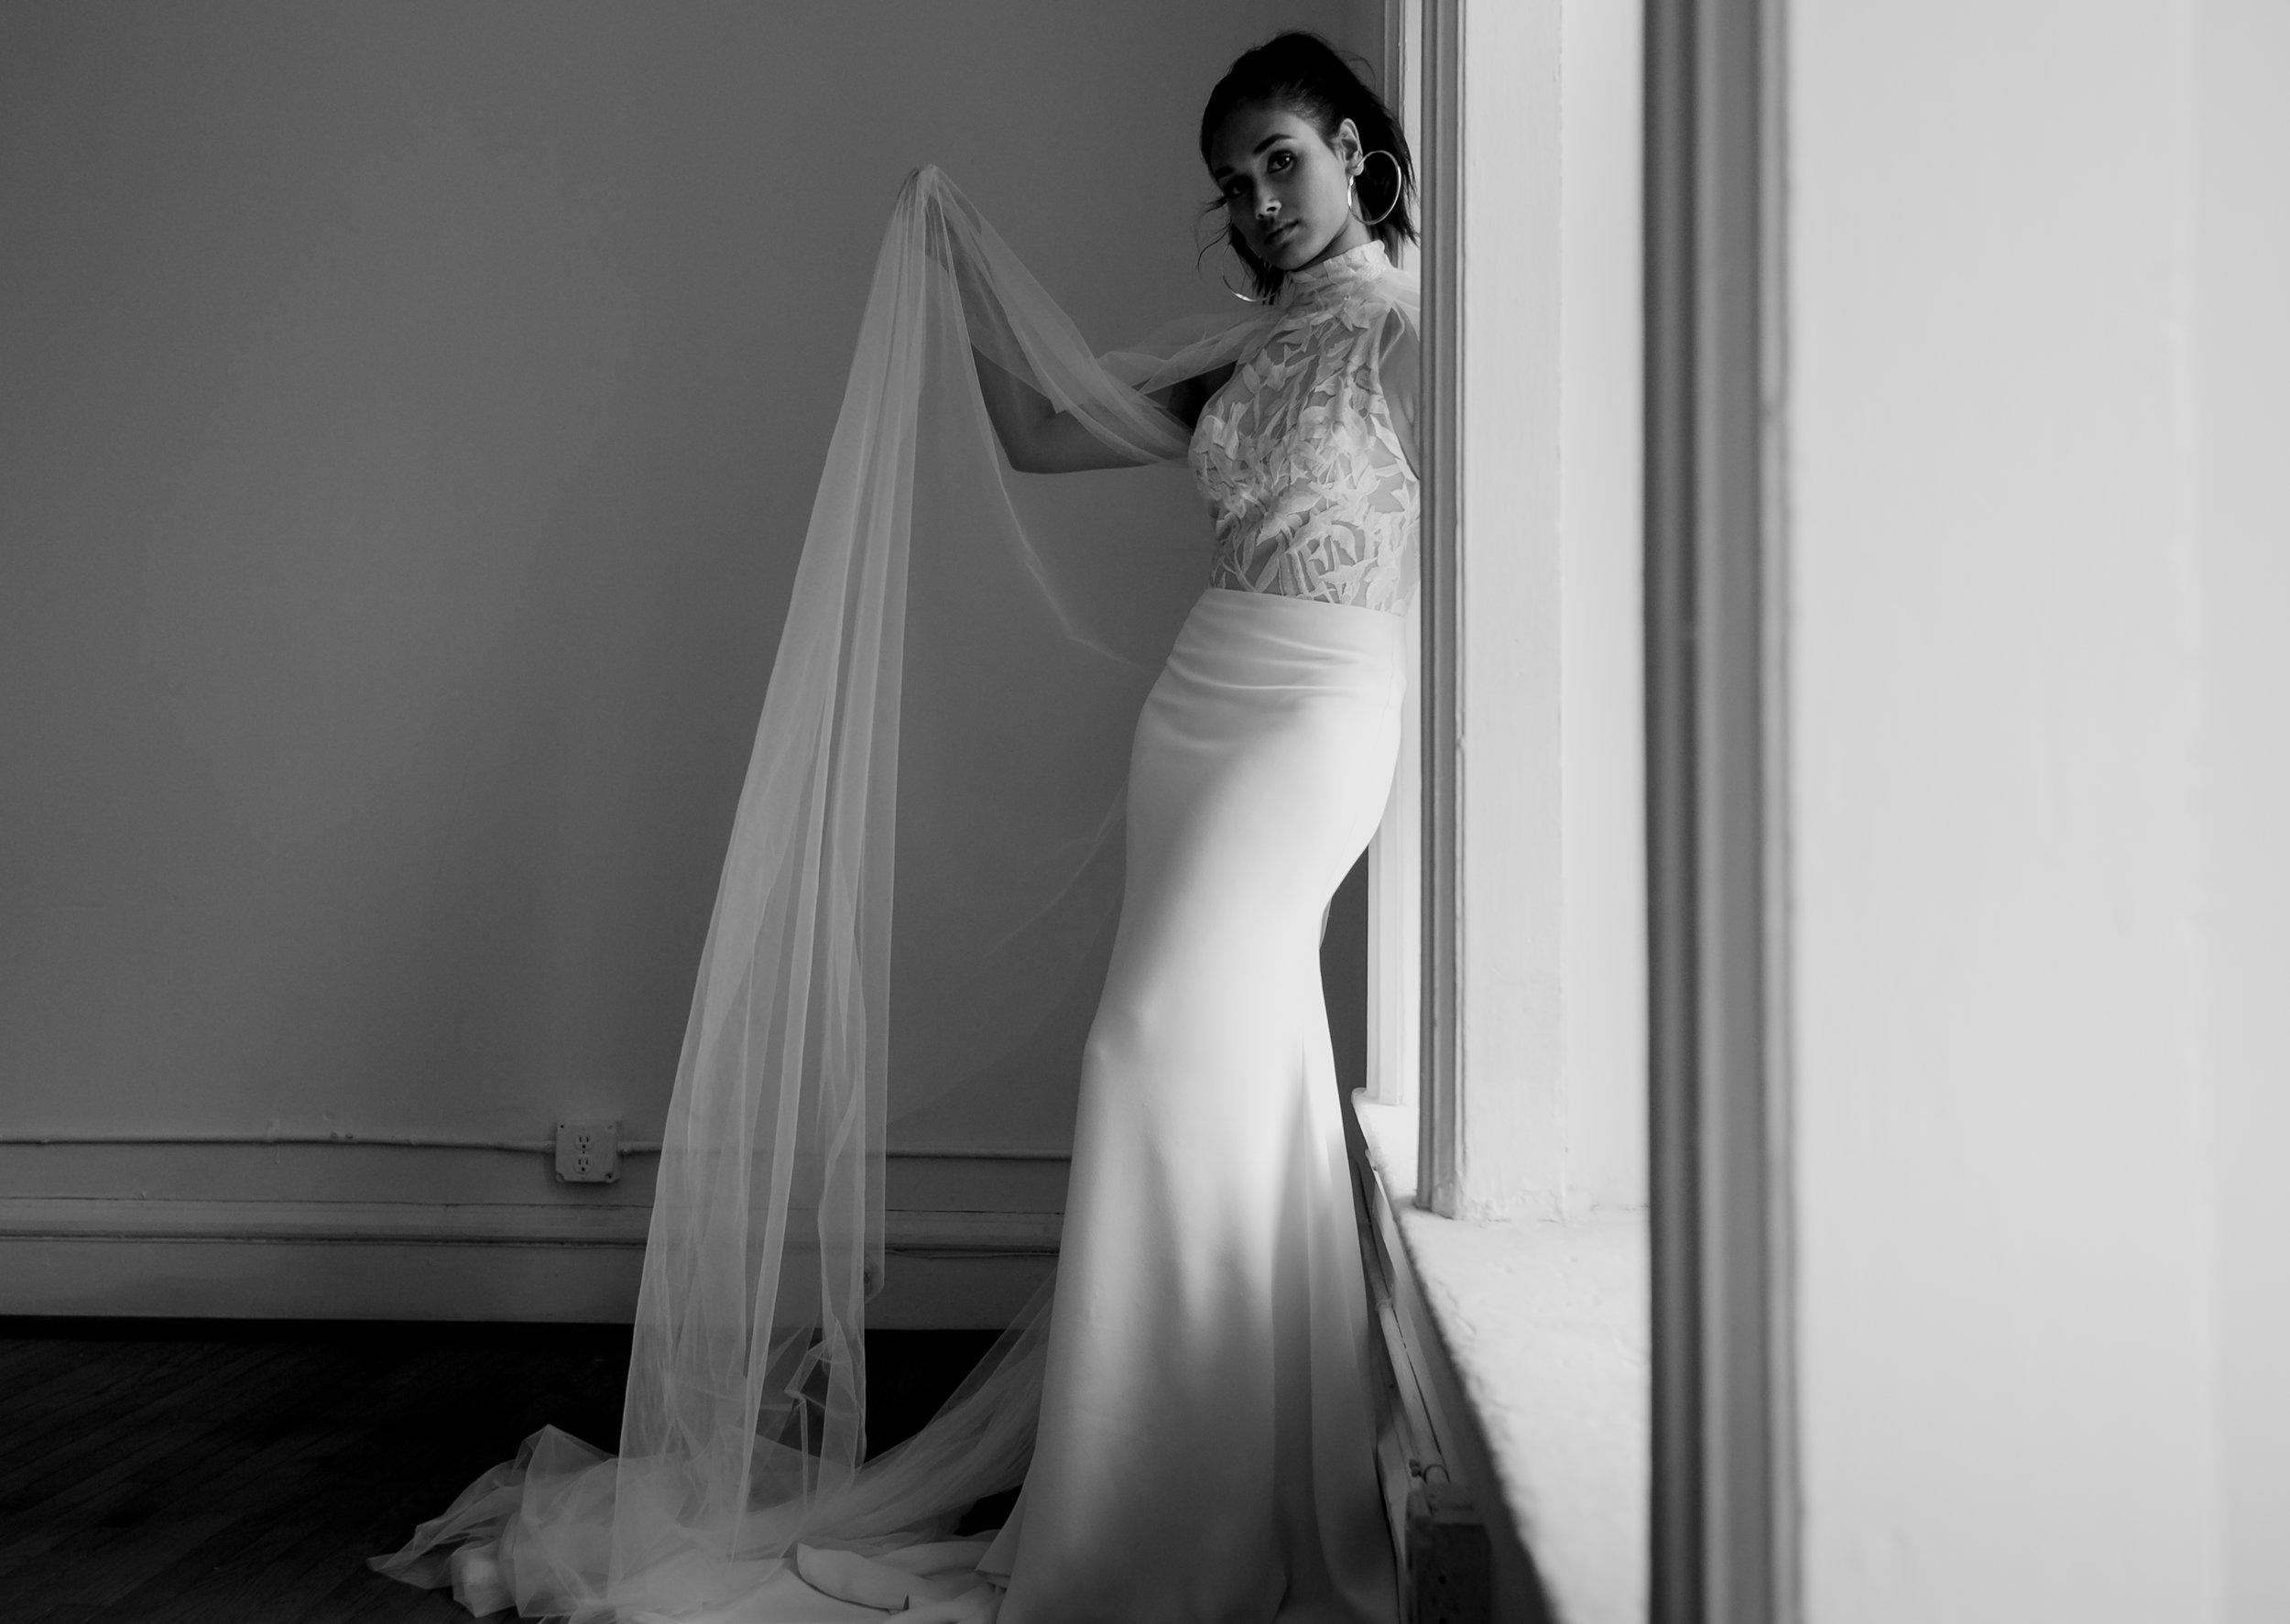 Chicago-Bride-Wedding-Dress-Varca-Edited-300.jpg